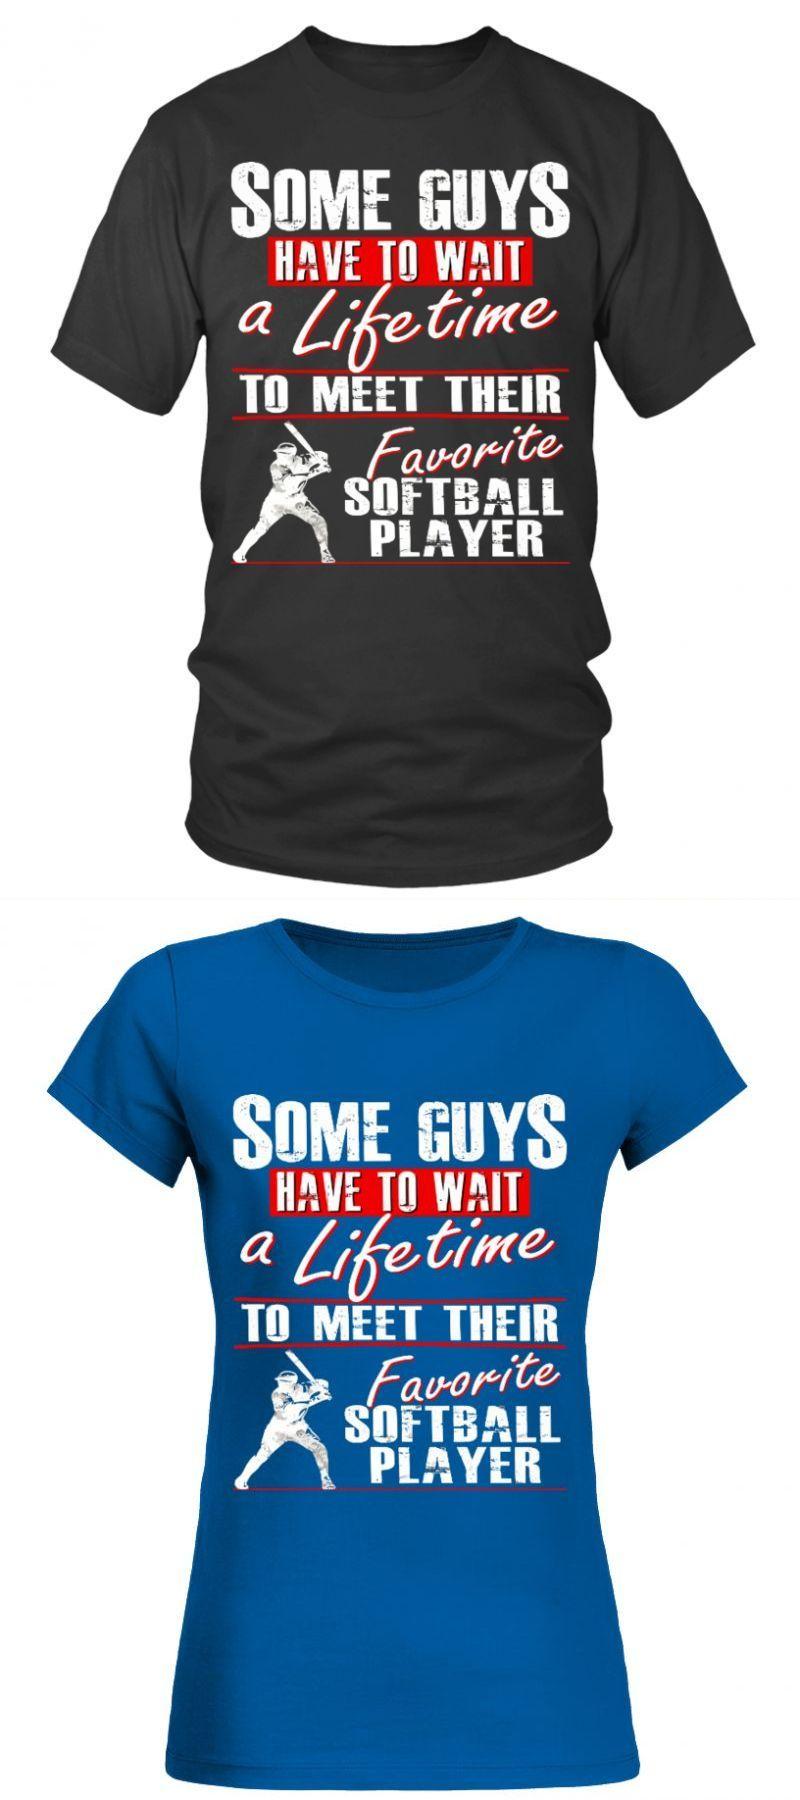 Halloween tshirt designs myfavoritesoftballplayer